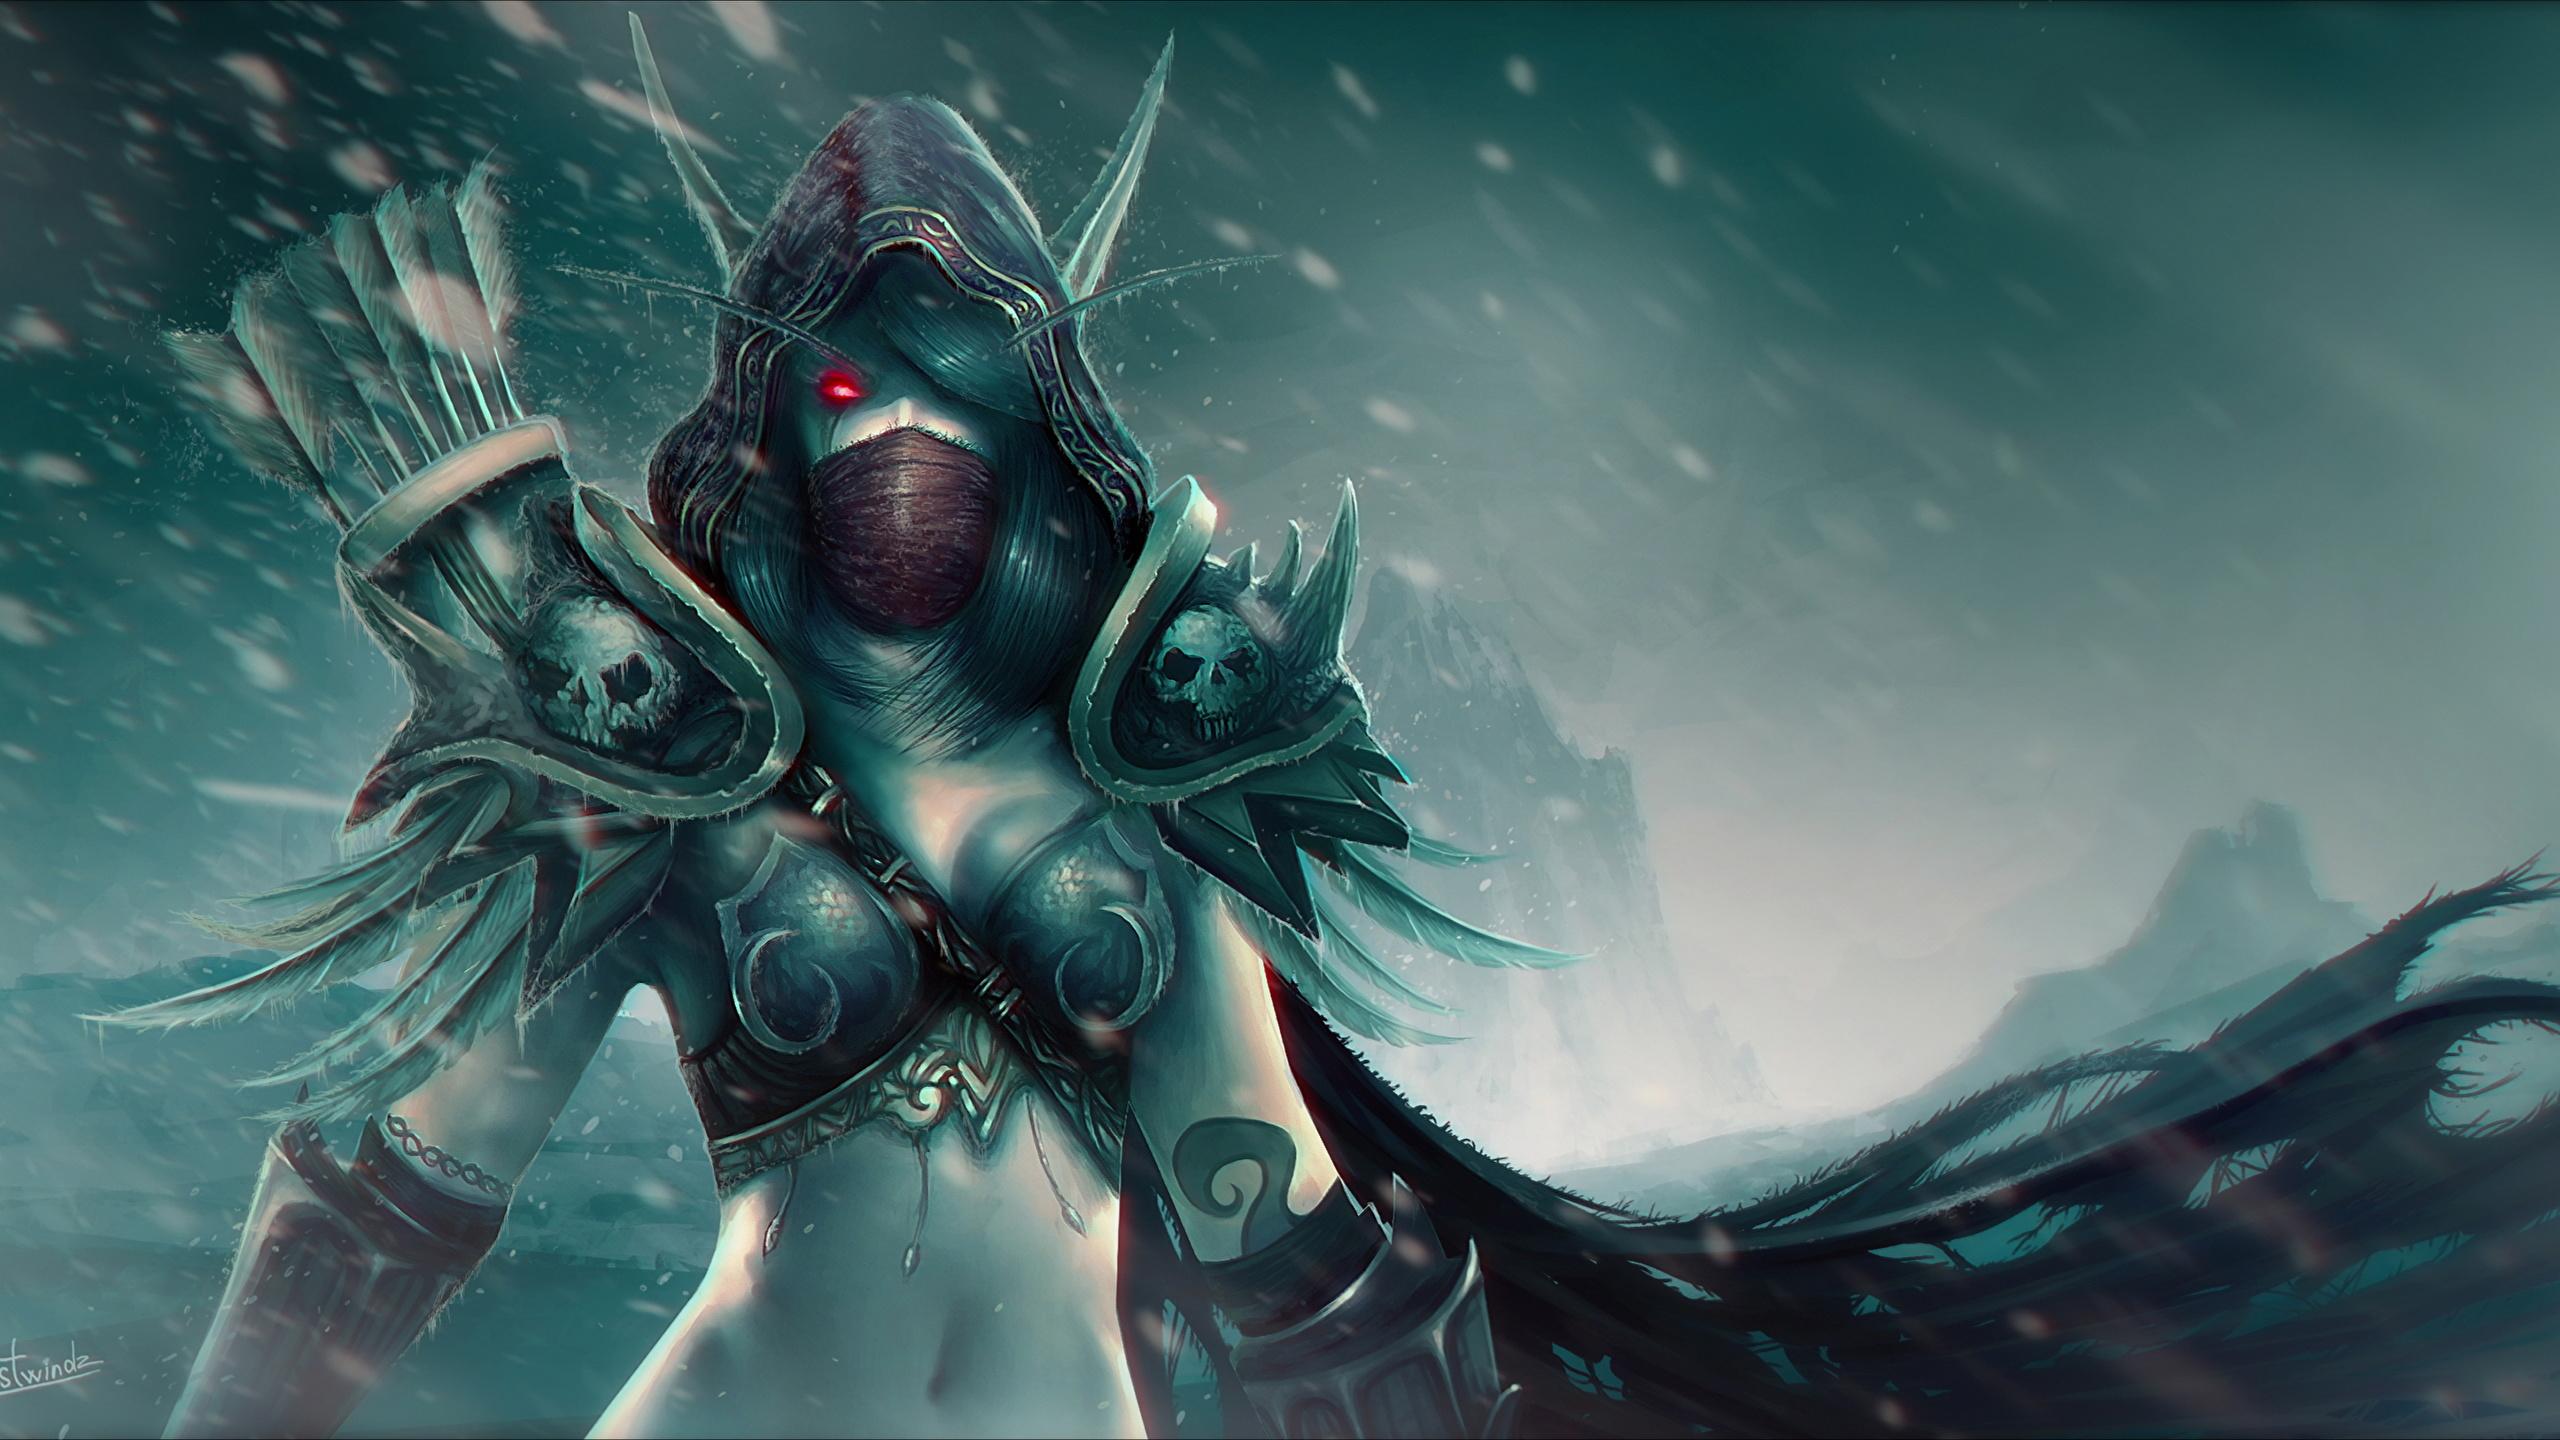 Images World Of Warcraft Elf Warrior Sylvanas Windrunner 2560x1440